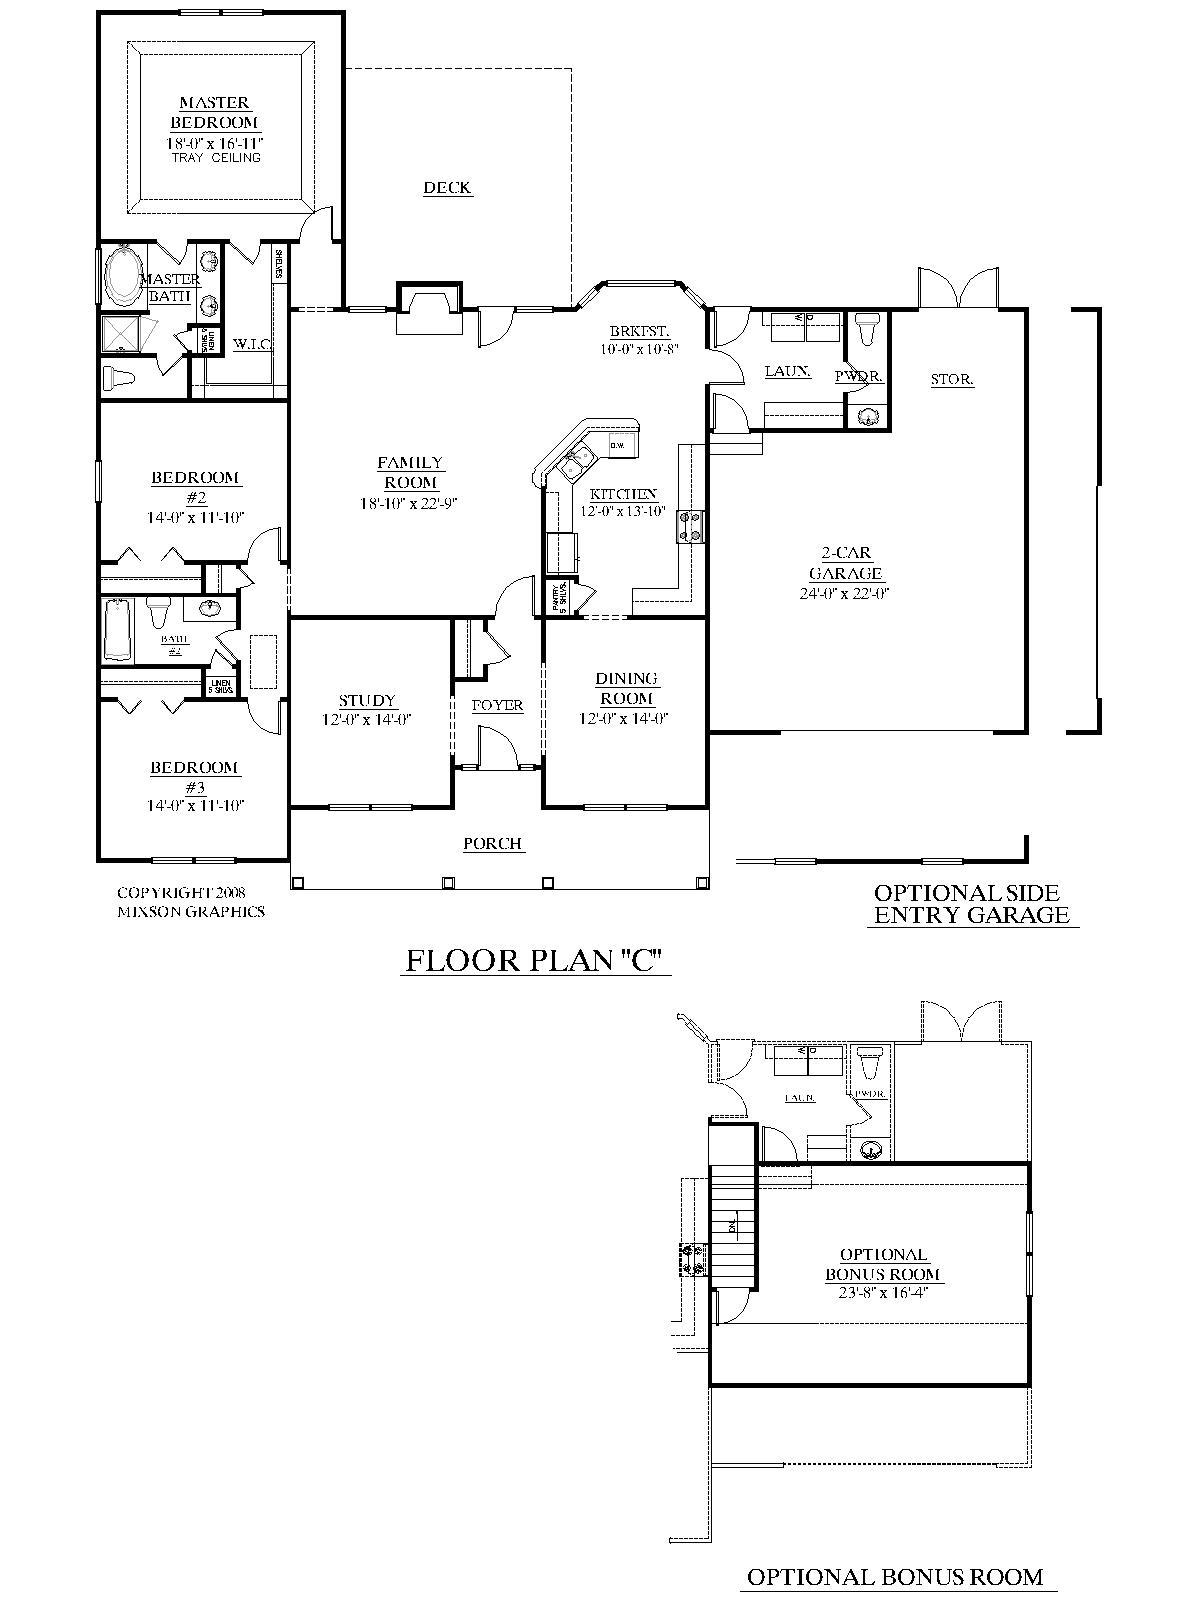 House Plan 2334 D The Manning D House Plans One Story Home Design Floor Plans Garage Floor Plans